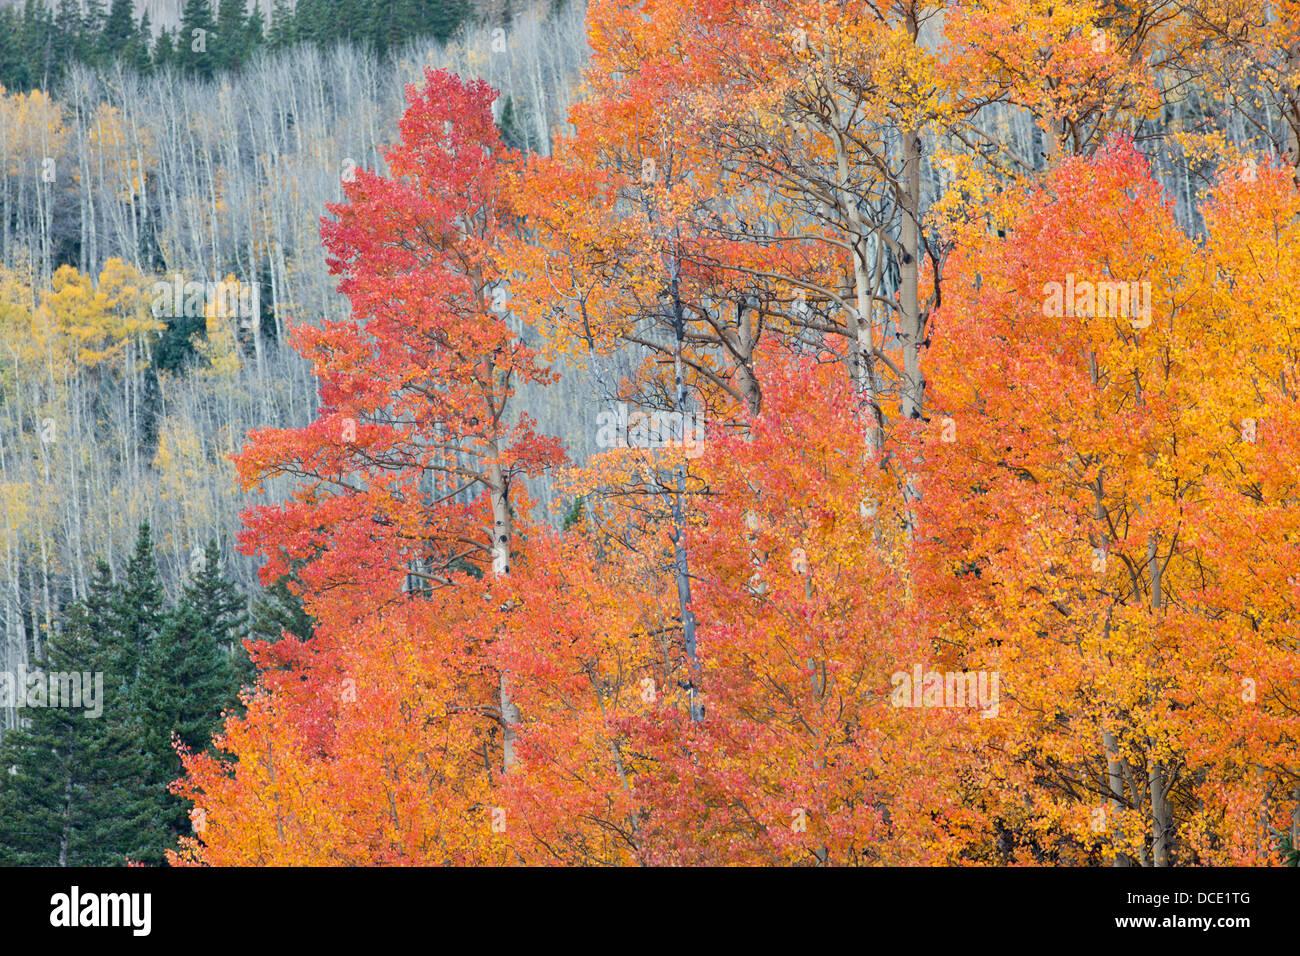 USA, Colorado, San Juan Mountains. Aspen trees in autumn colors. - Stock Image